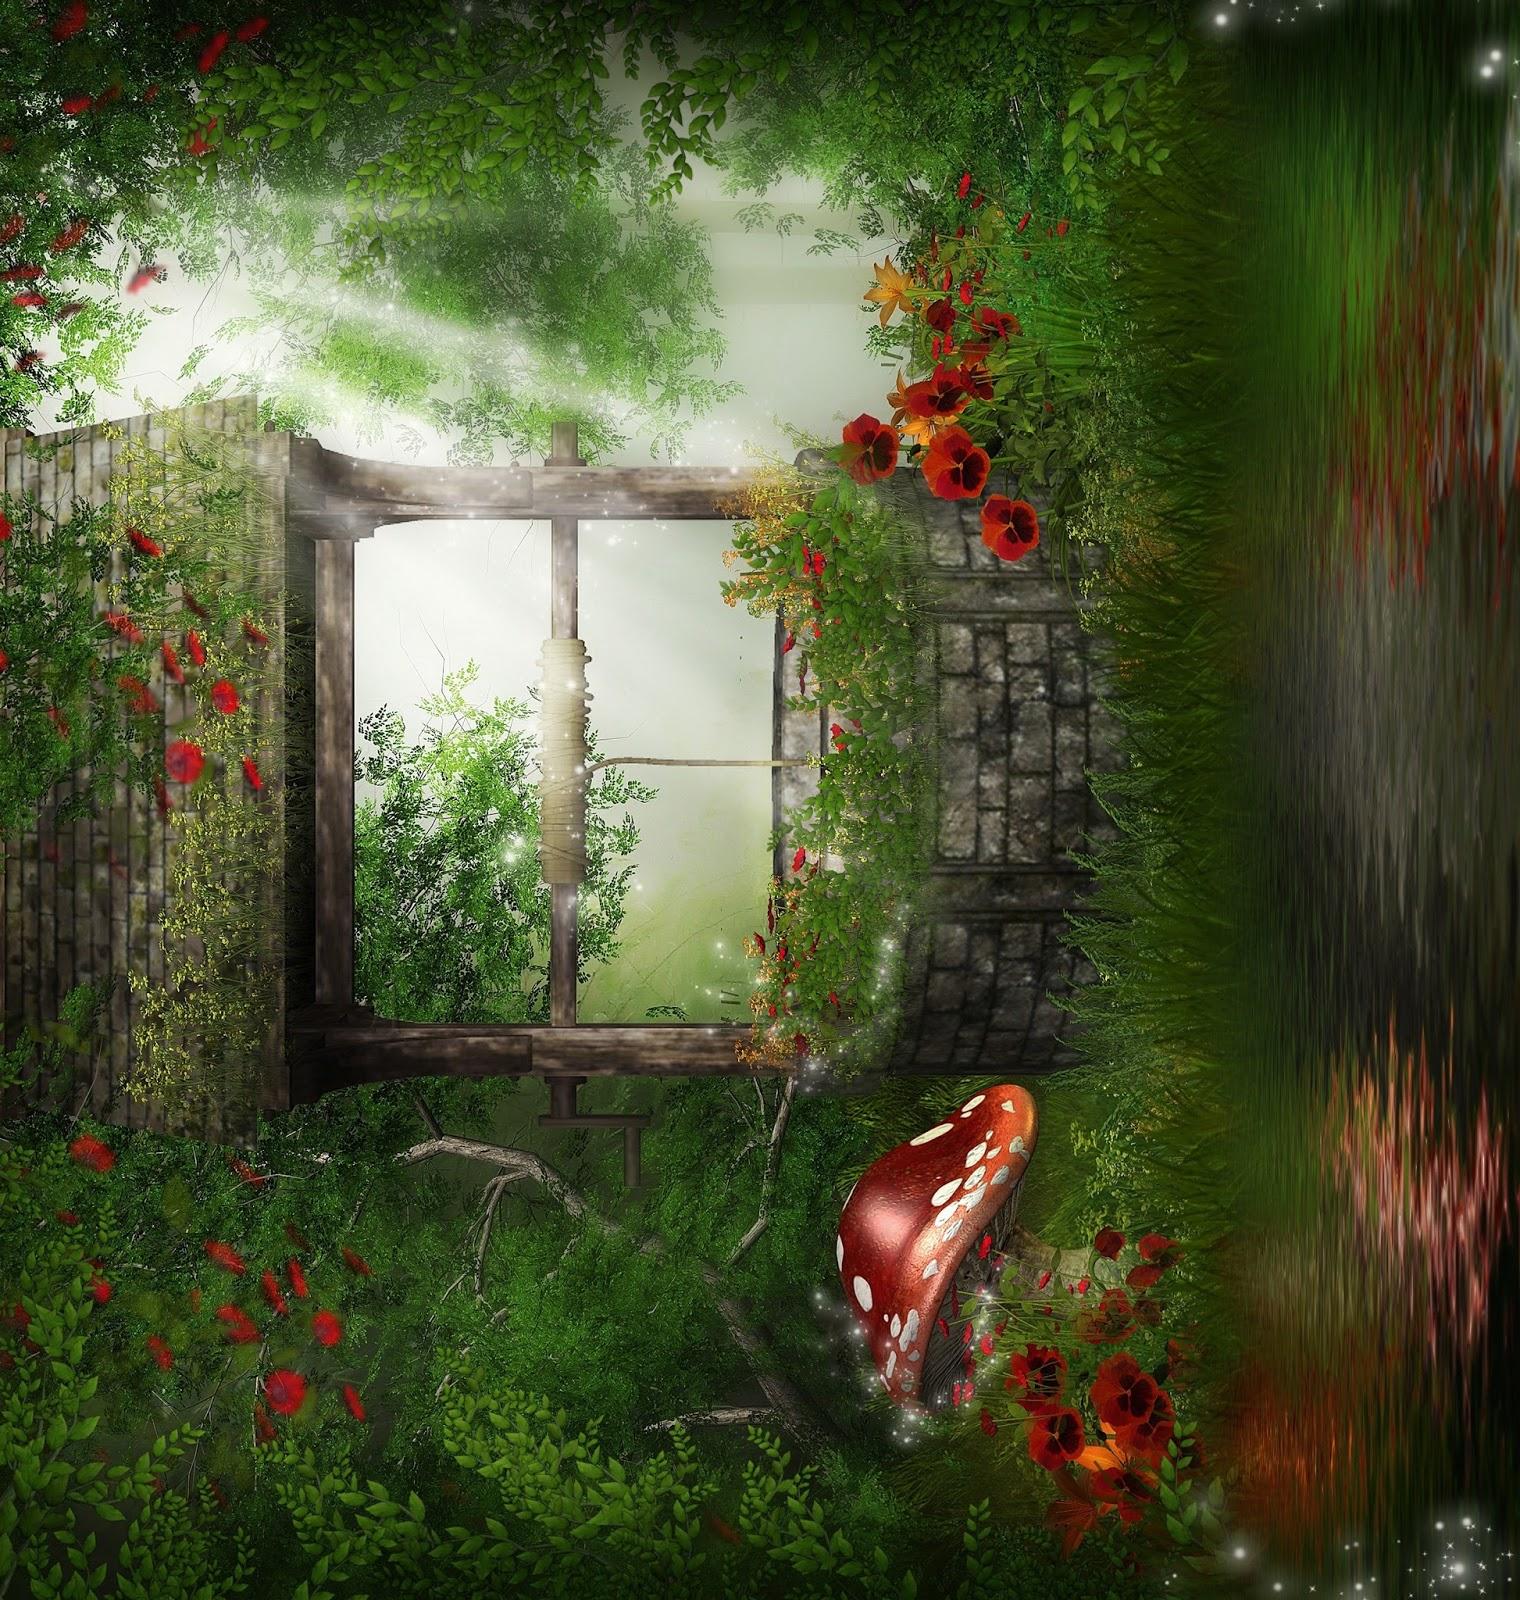 Studio Background HD 2017 Nature Image Download